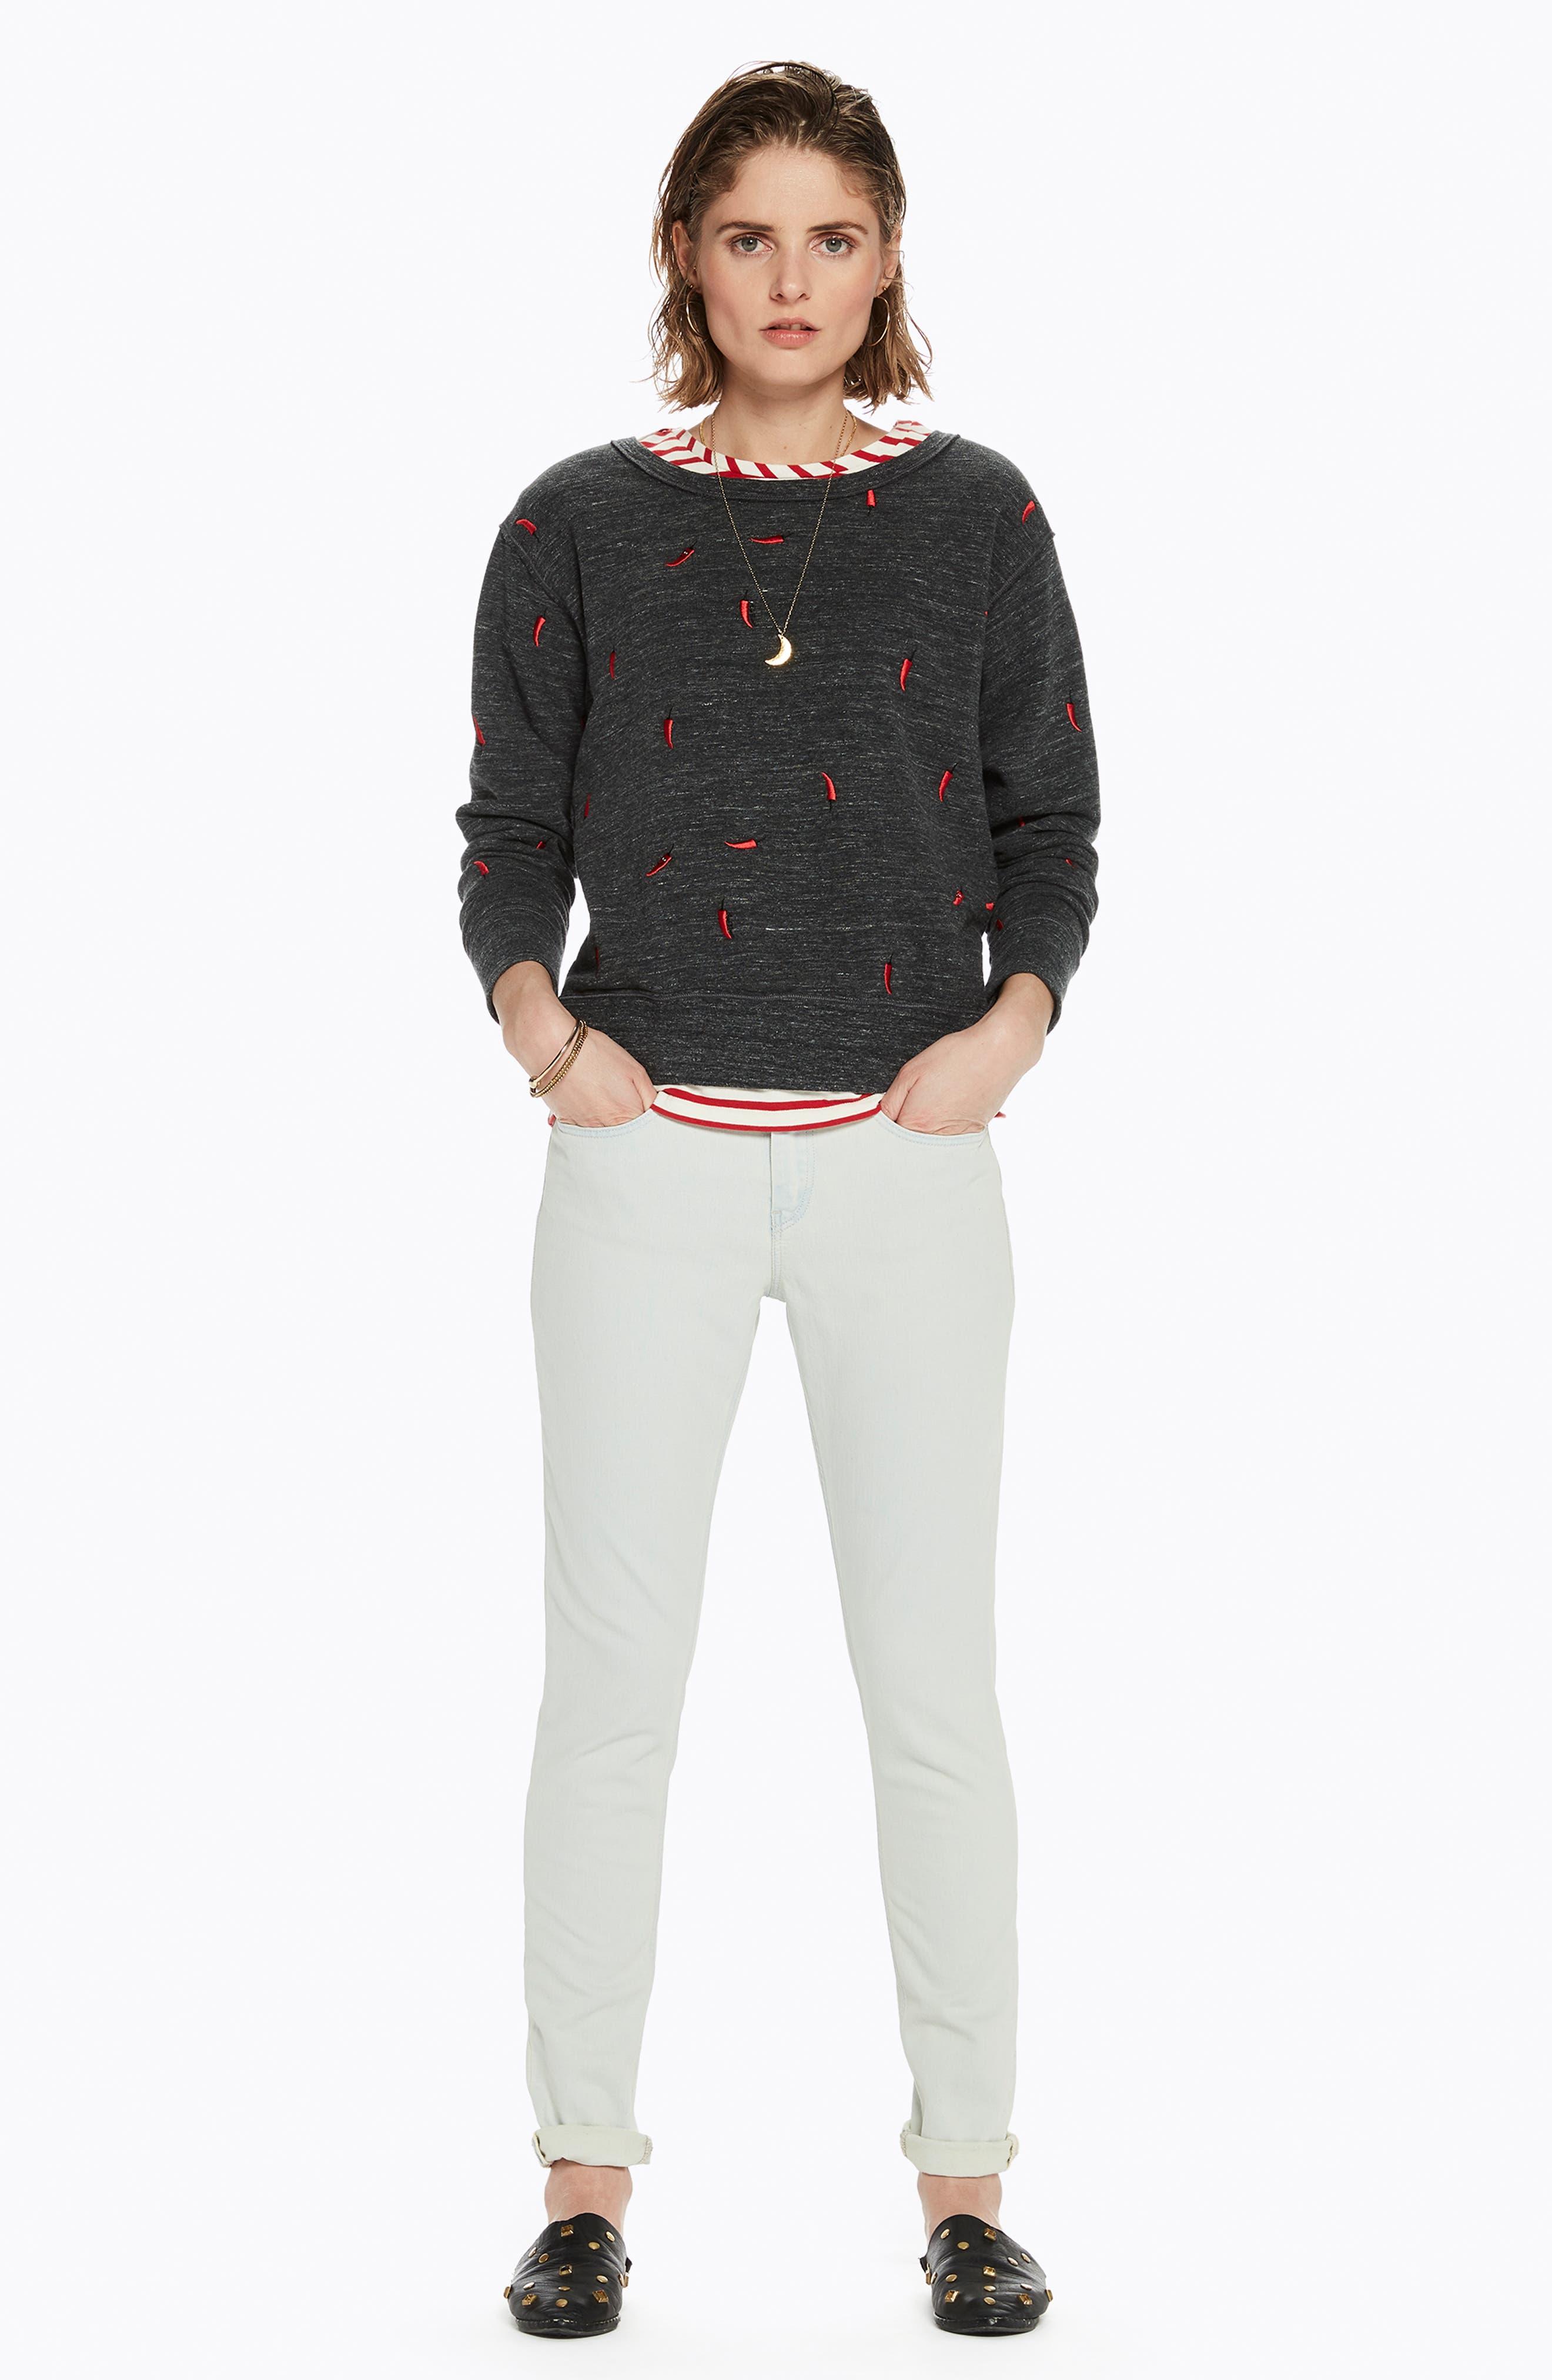 Chili Pepper Crewneck Sweatshirt,                             Alternate thumbnail 8, color,                             021